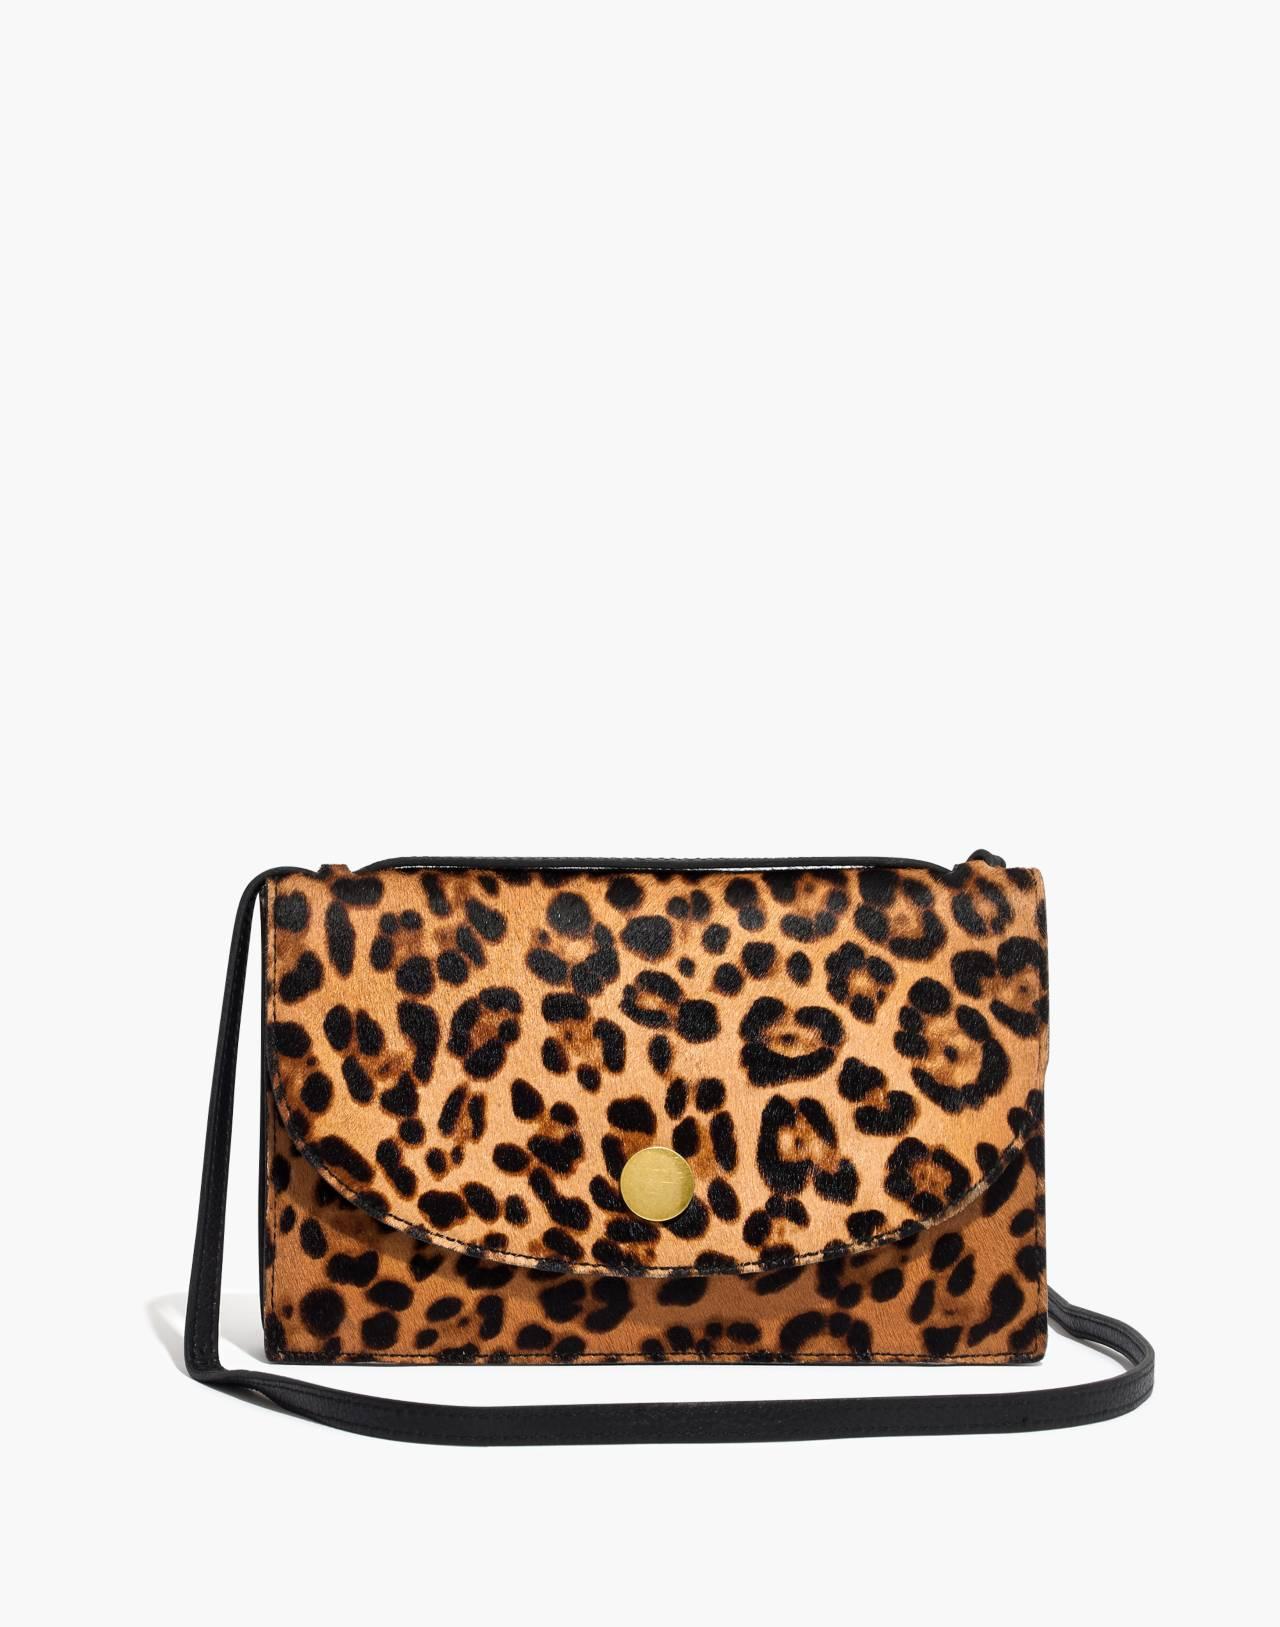 The Slim Convertible Bag in Leopard Calf Hair in truffle multi image 1